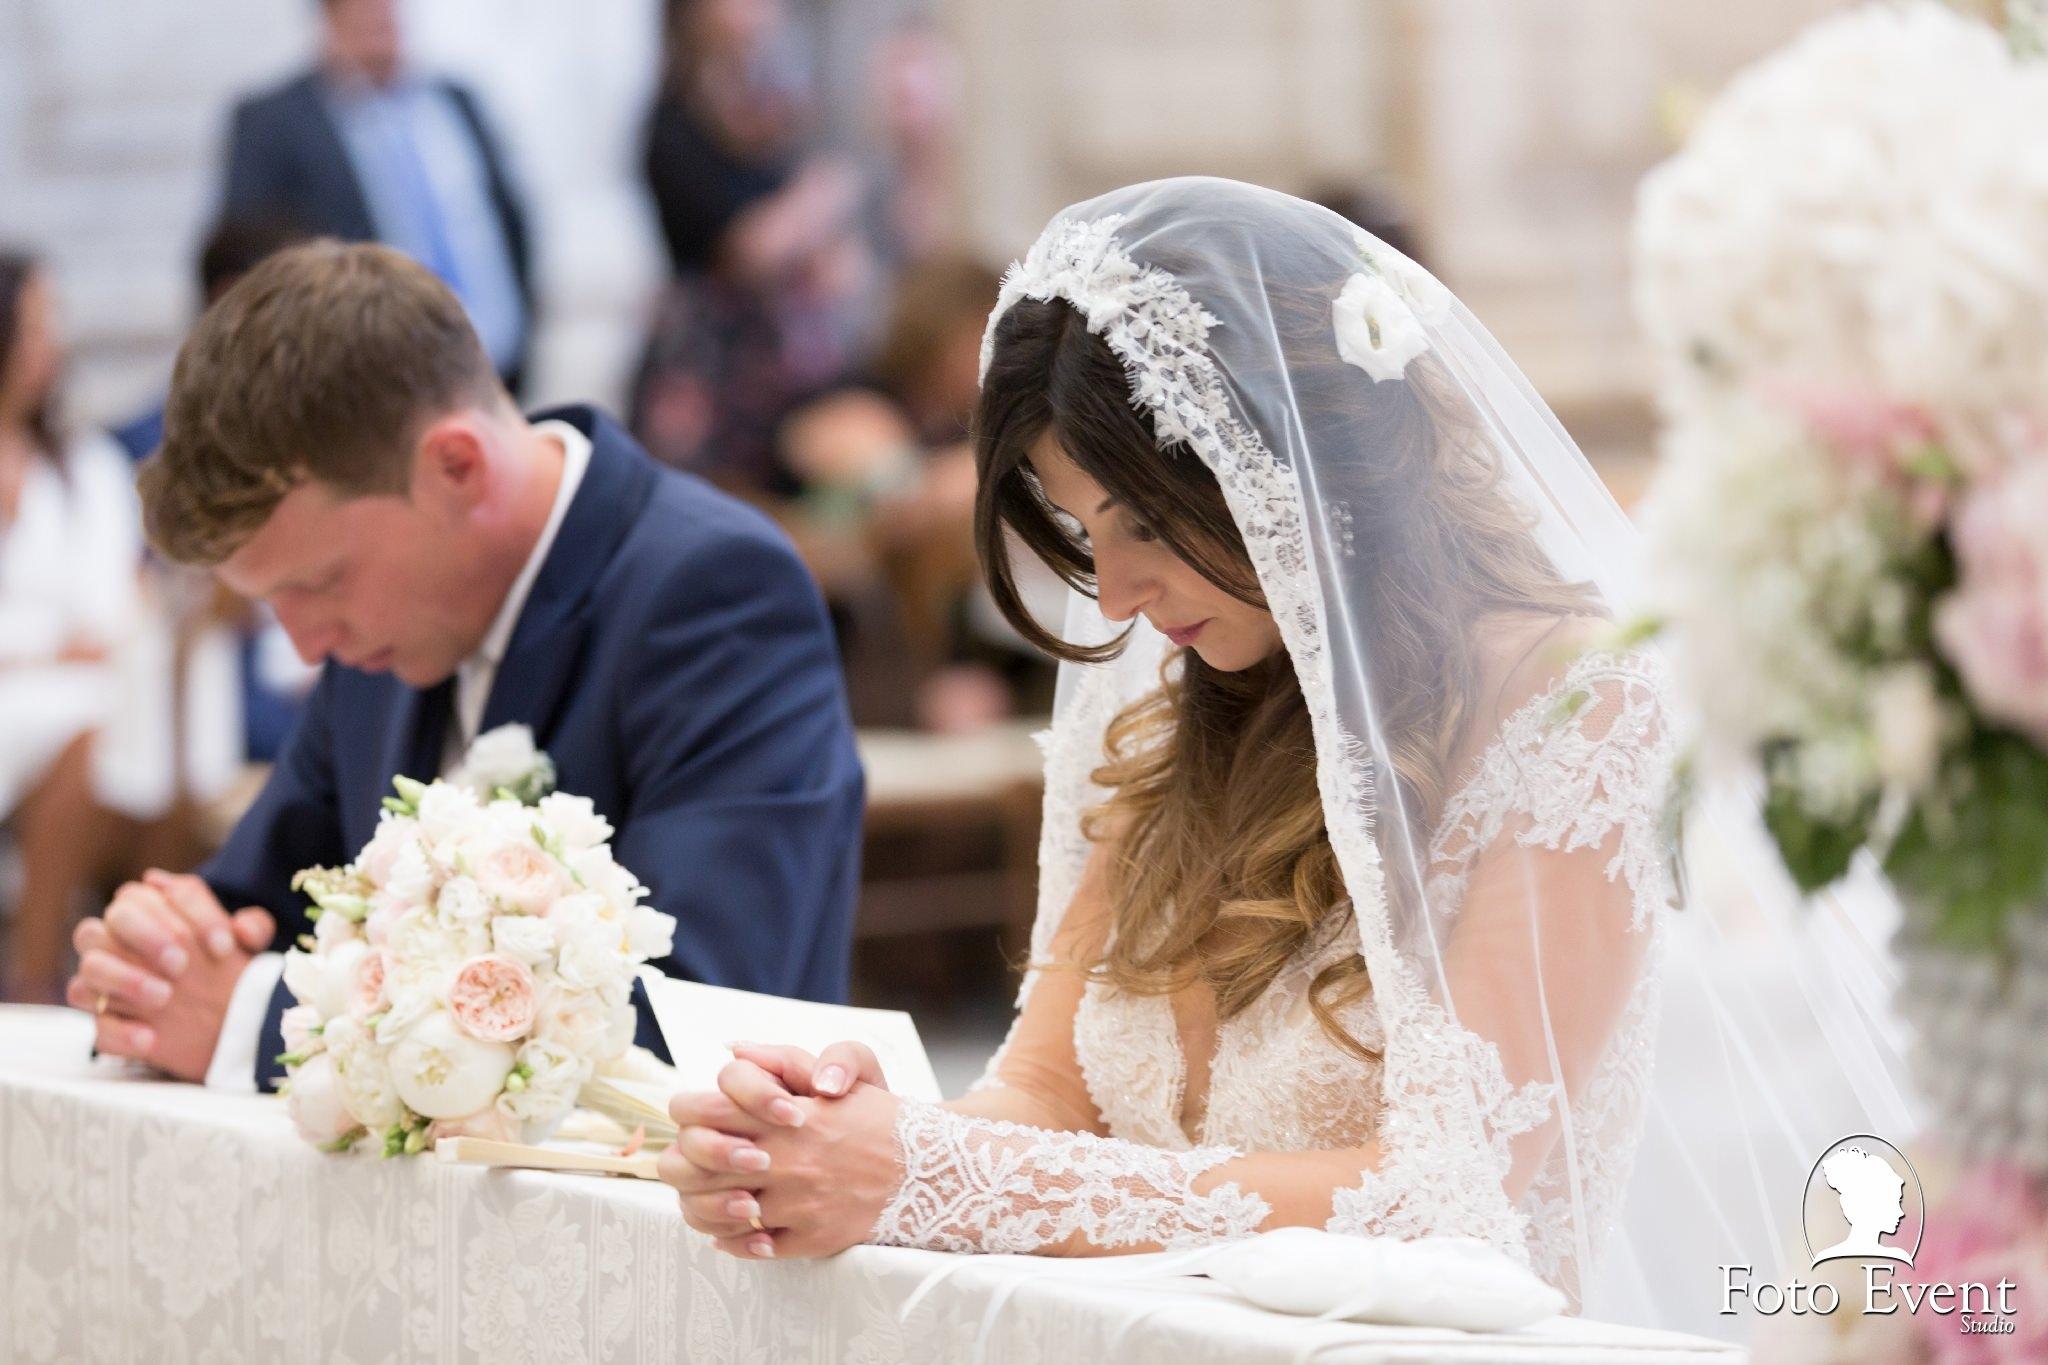 2017-07-21 Matrimonio Adriana e Giuseppe Dorsi zoom 178 CD FOTO